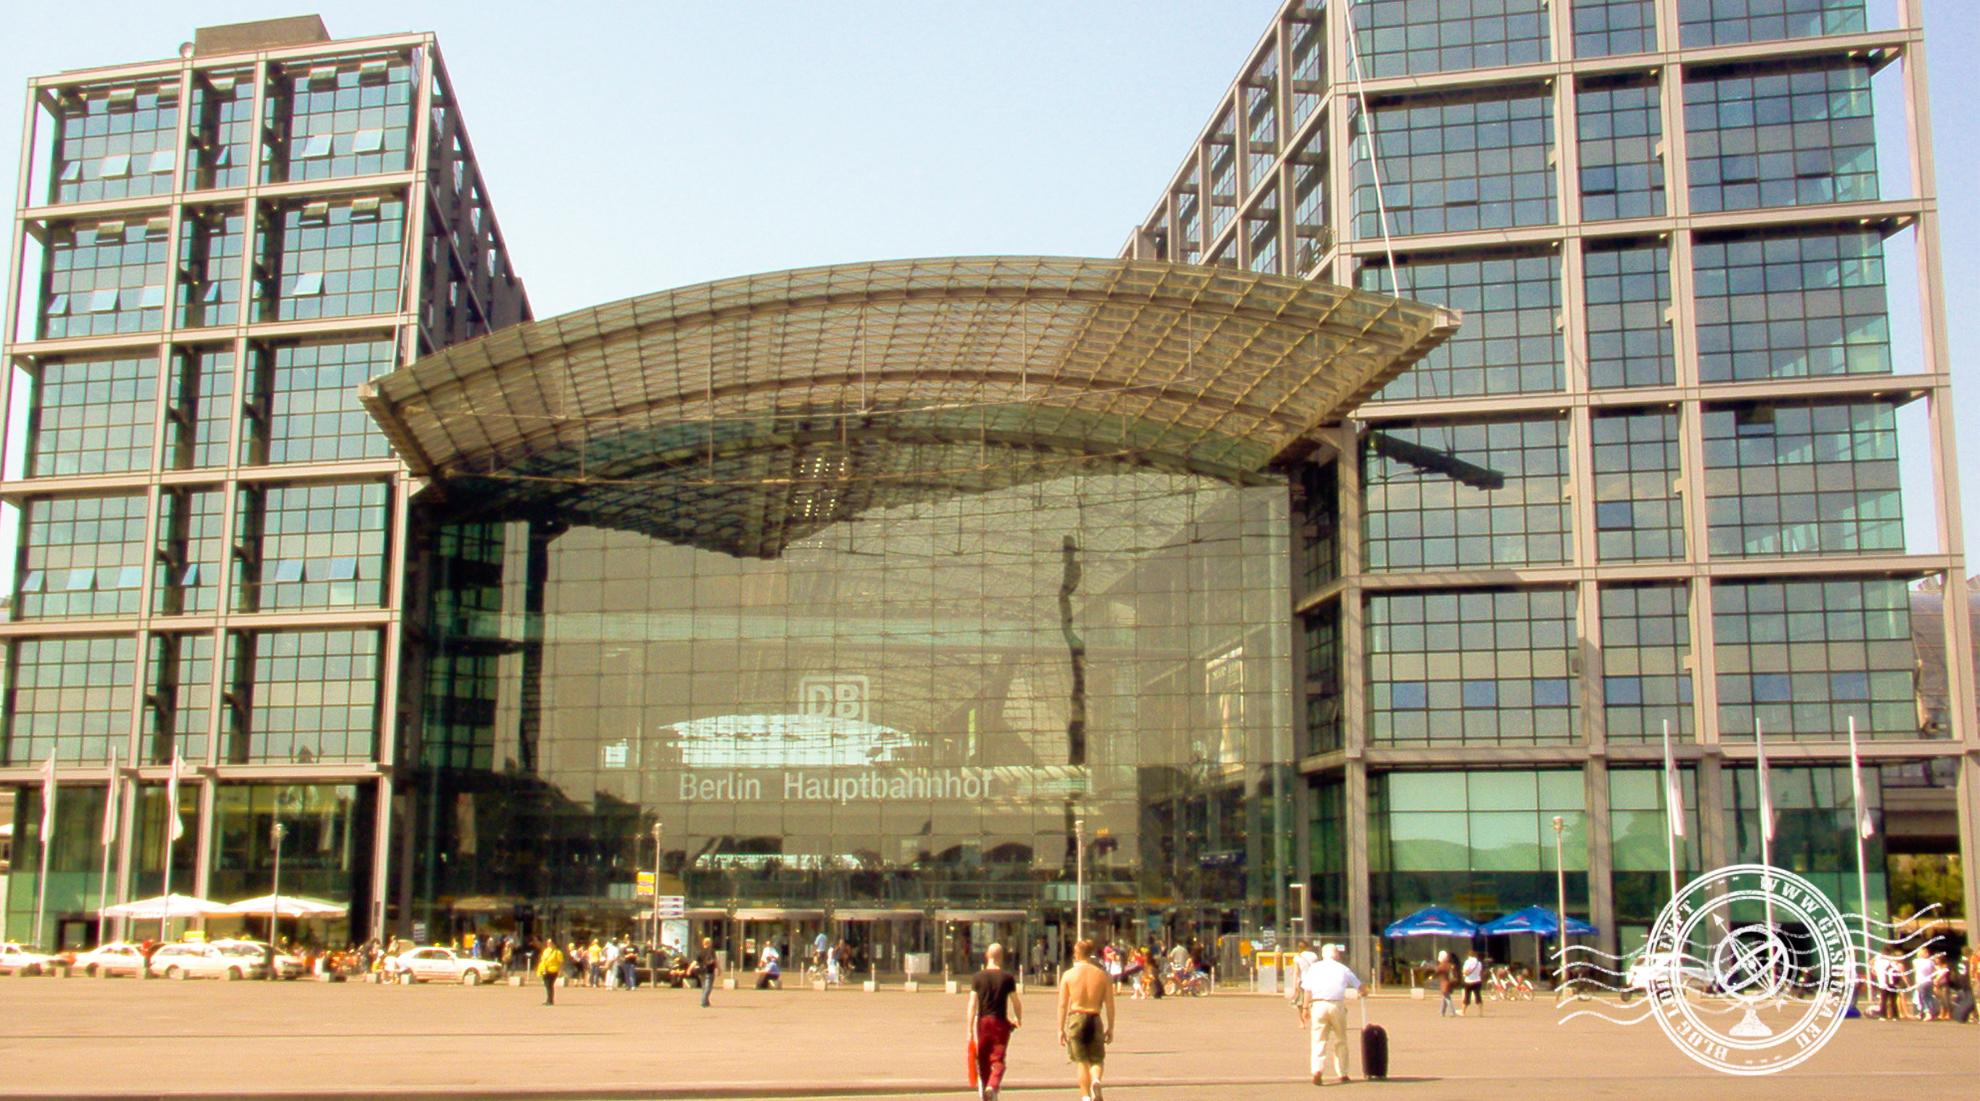 Berlin Hauptbahnhof - Berlin's main train station